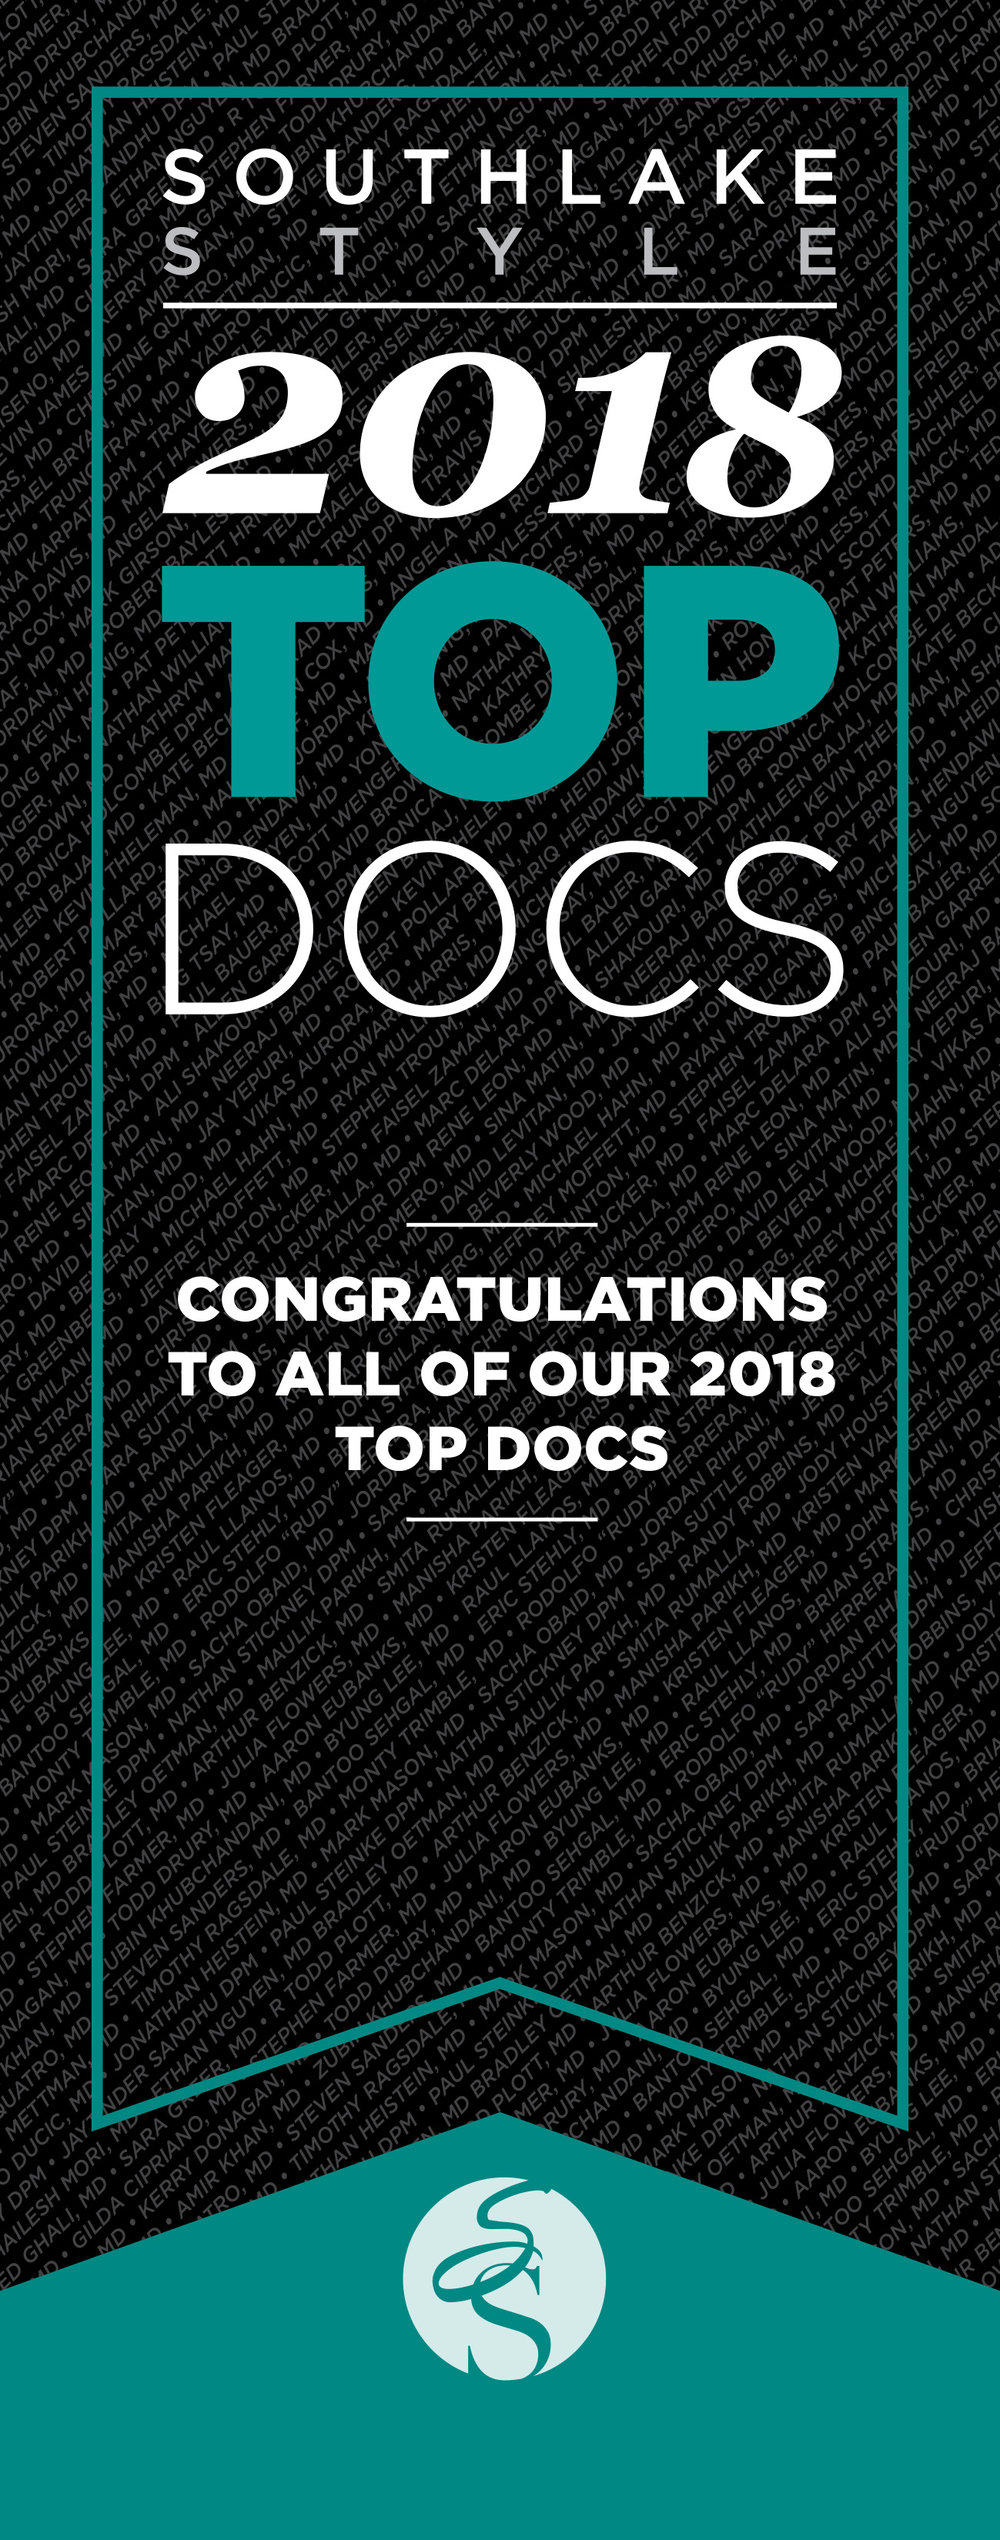 TopDocsBanner_2018_FINAL.jpg